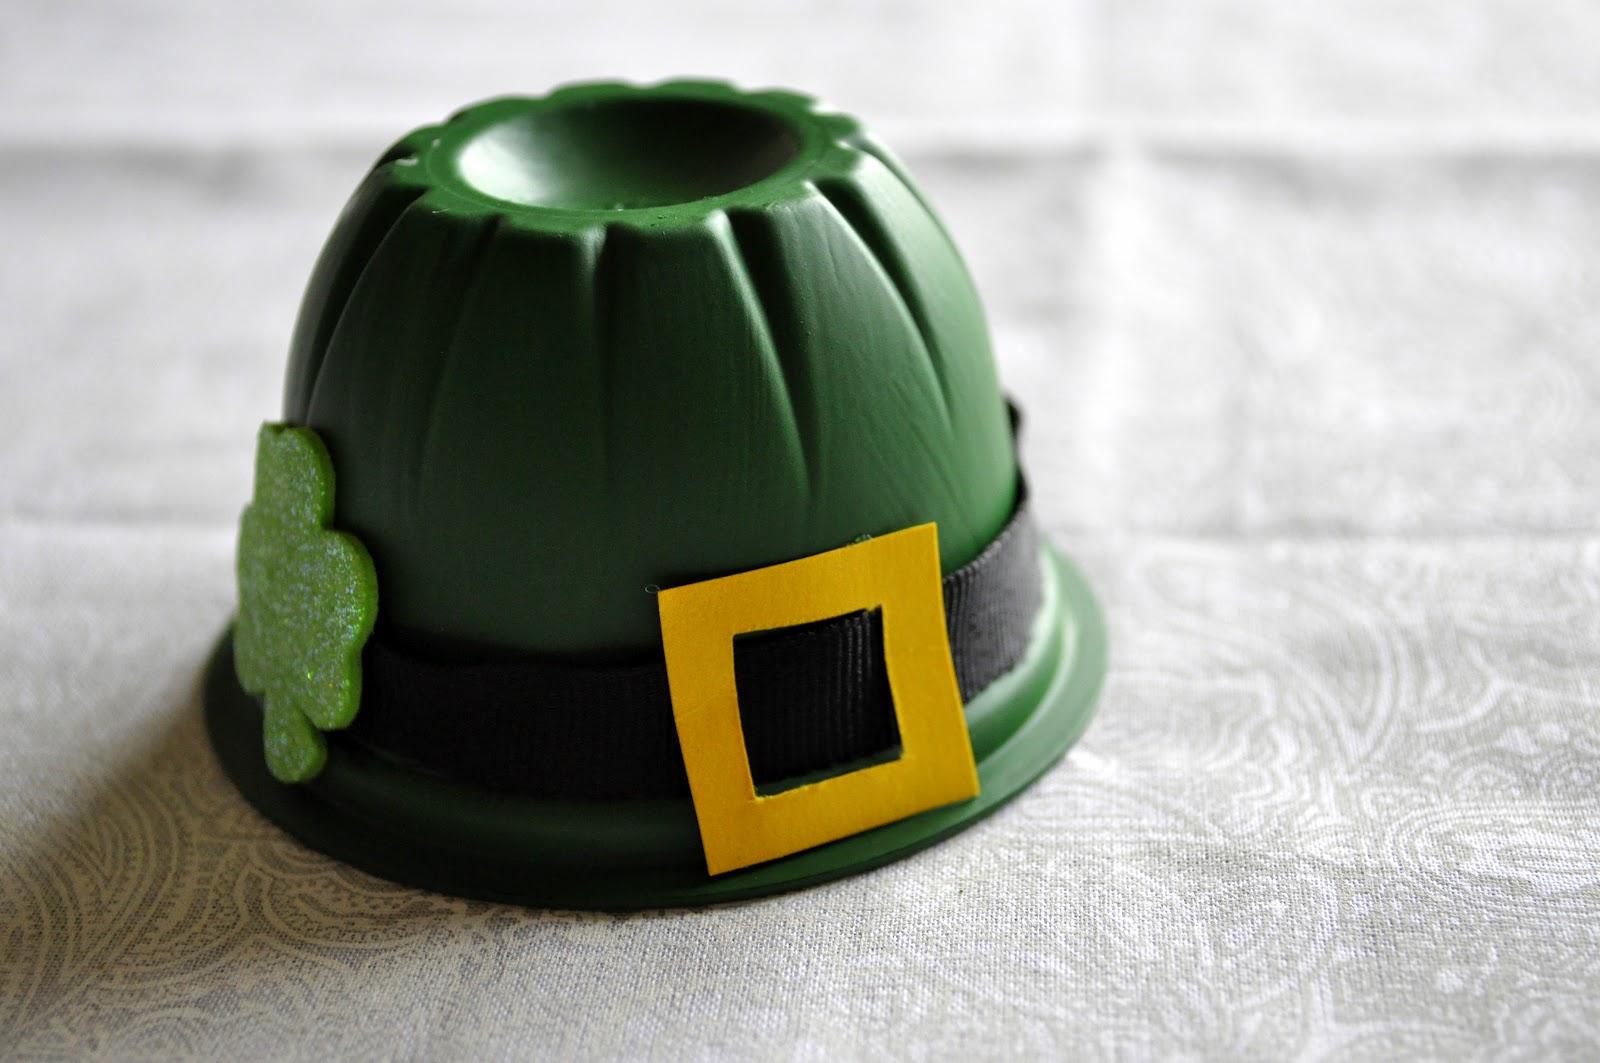 Marble-Painted Glitter Shamrocks and Leprechaun Hat Treats ...